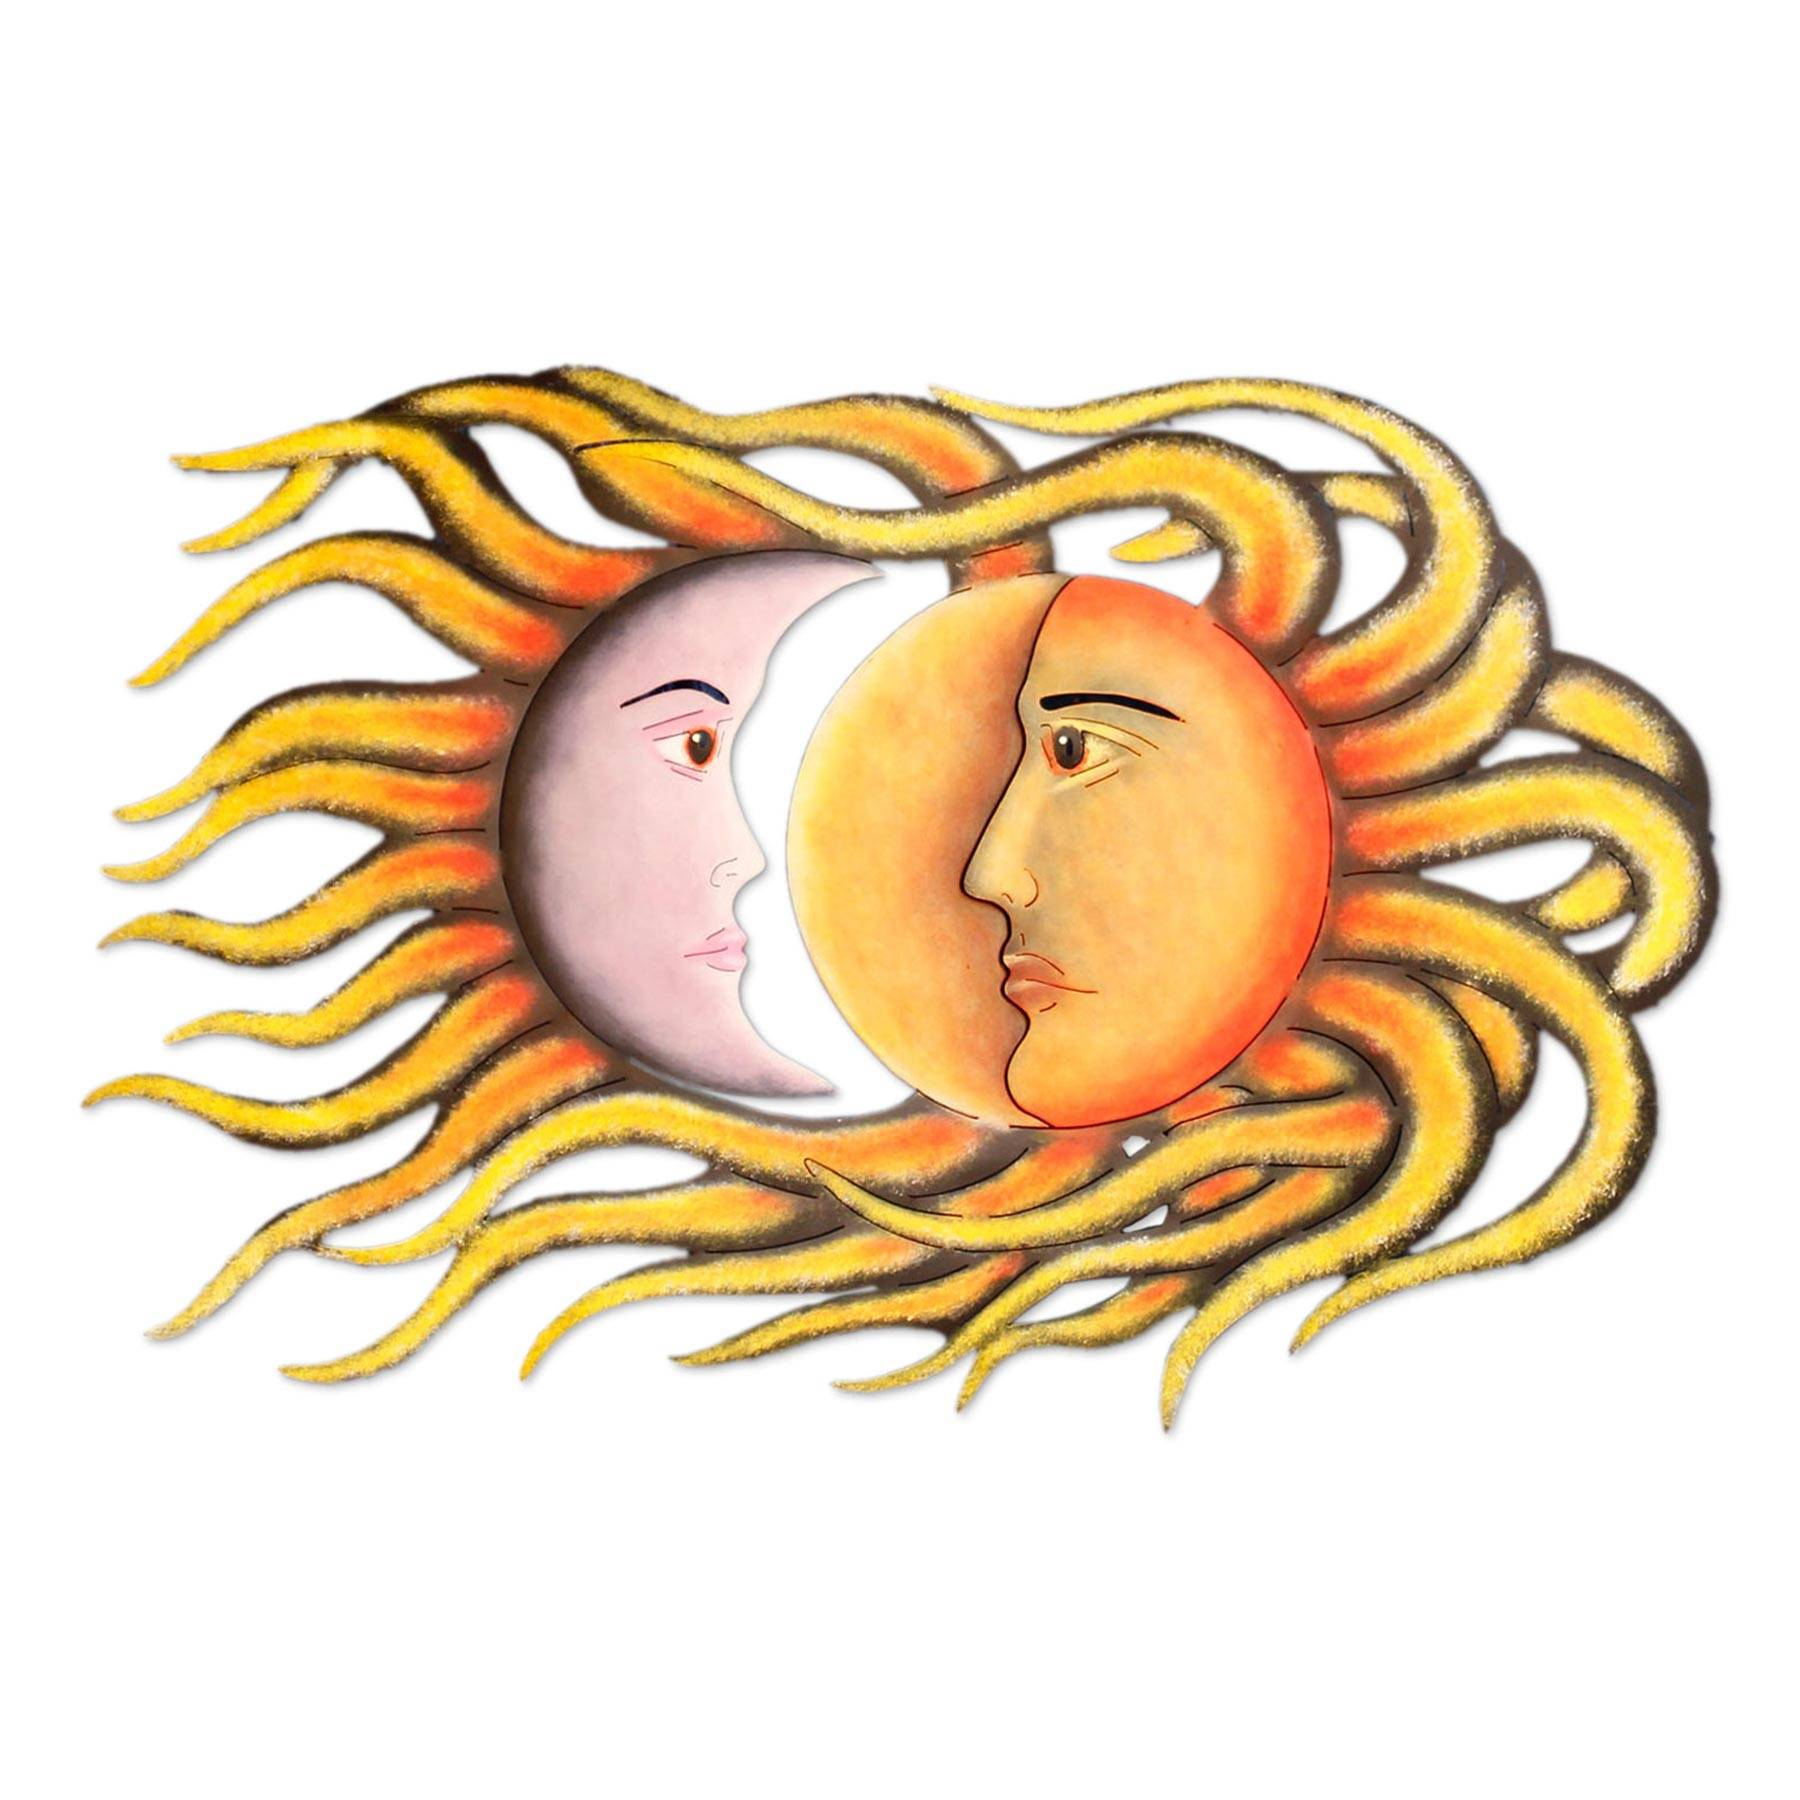 Mexican Sun and Moon Eclipse Steel Wall Art - Cosmic Romance   NOVICA